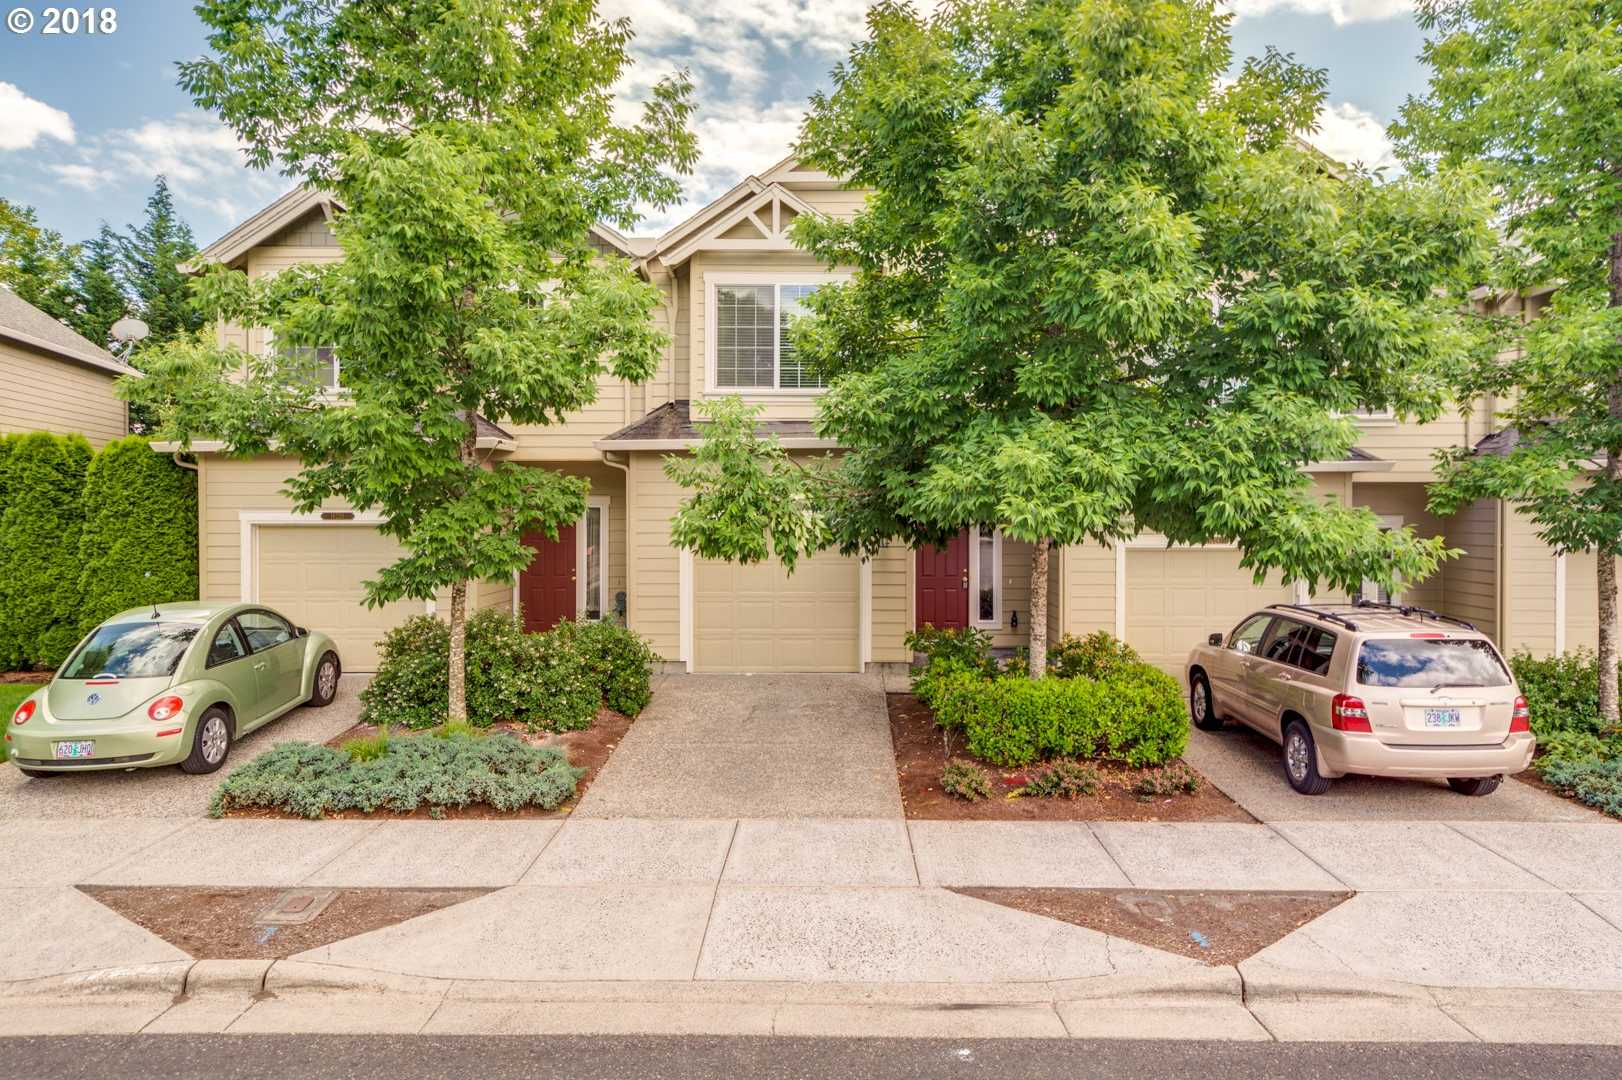 $344,900 - 3Br/3Ba -  for Sale in Kaiser Ridge, Portland